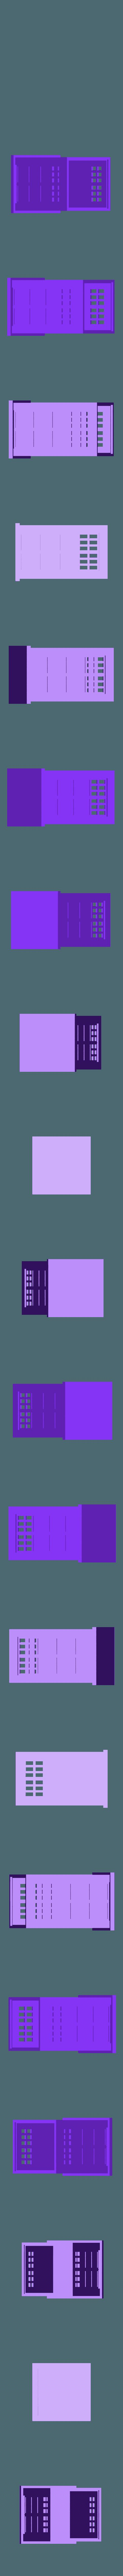 tardis structure.stl Download STL file tardis (table bin, box, etc...) • 3D print model, YOHAN_3D